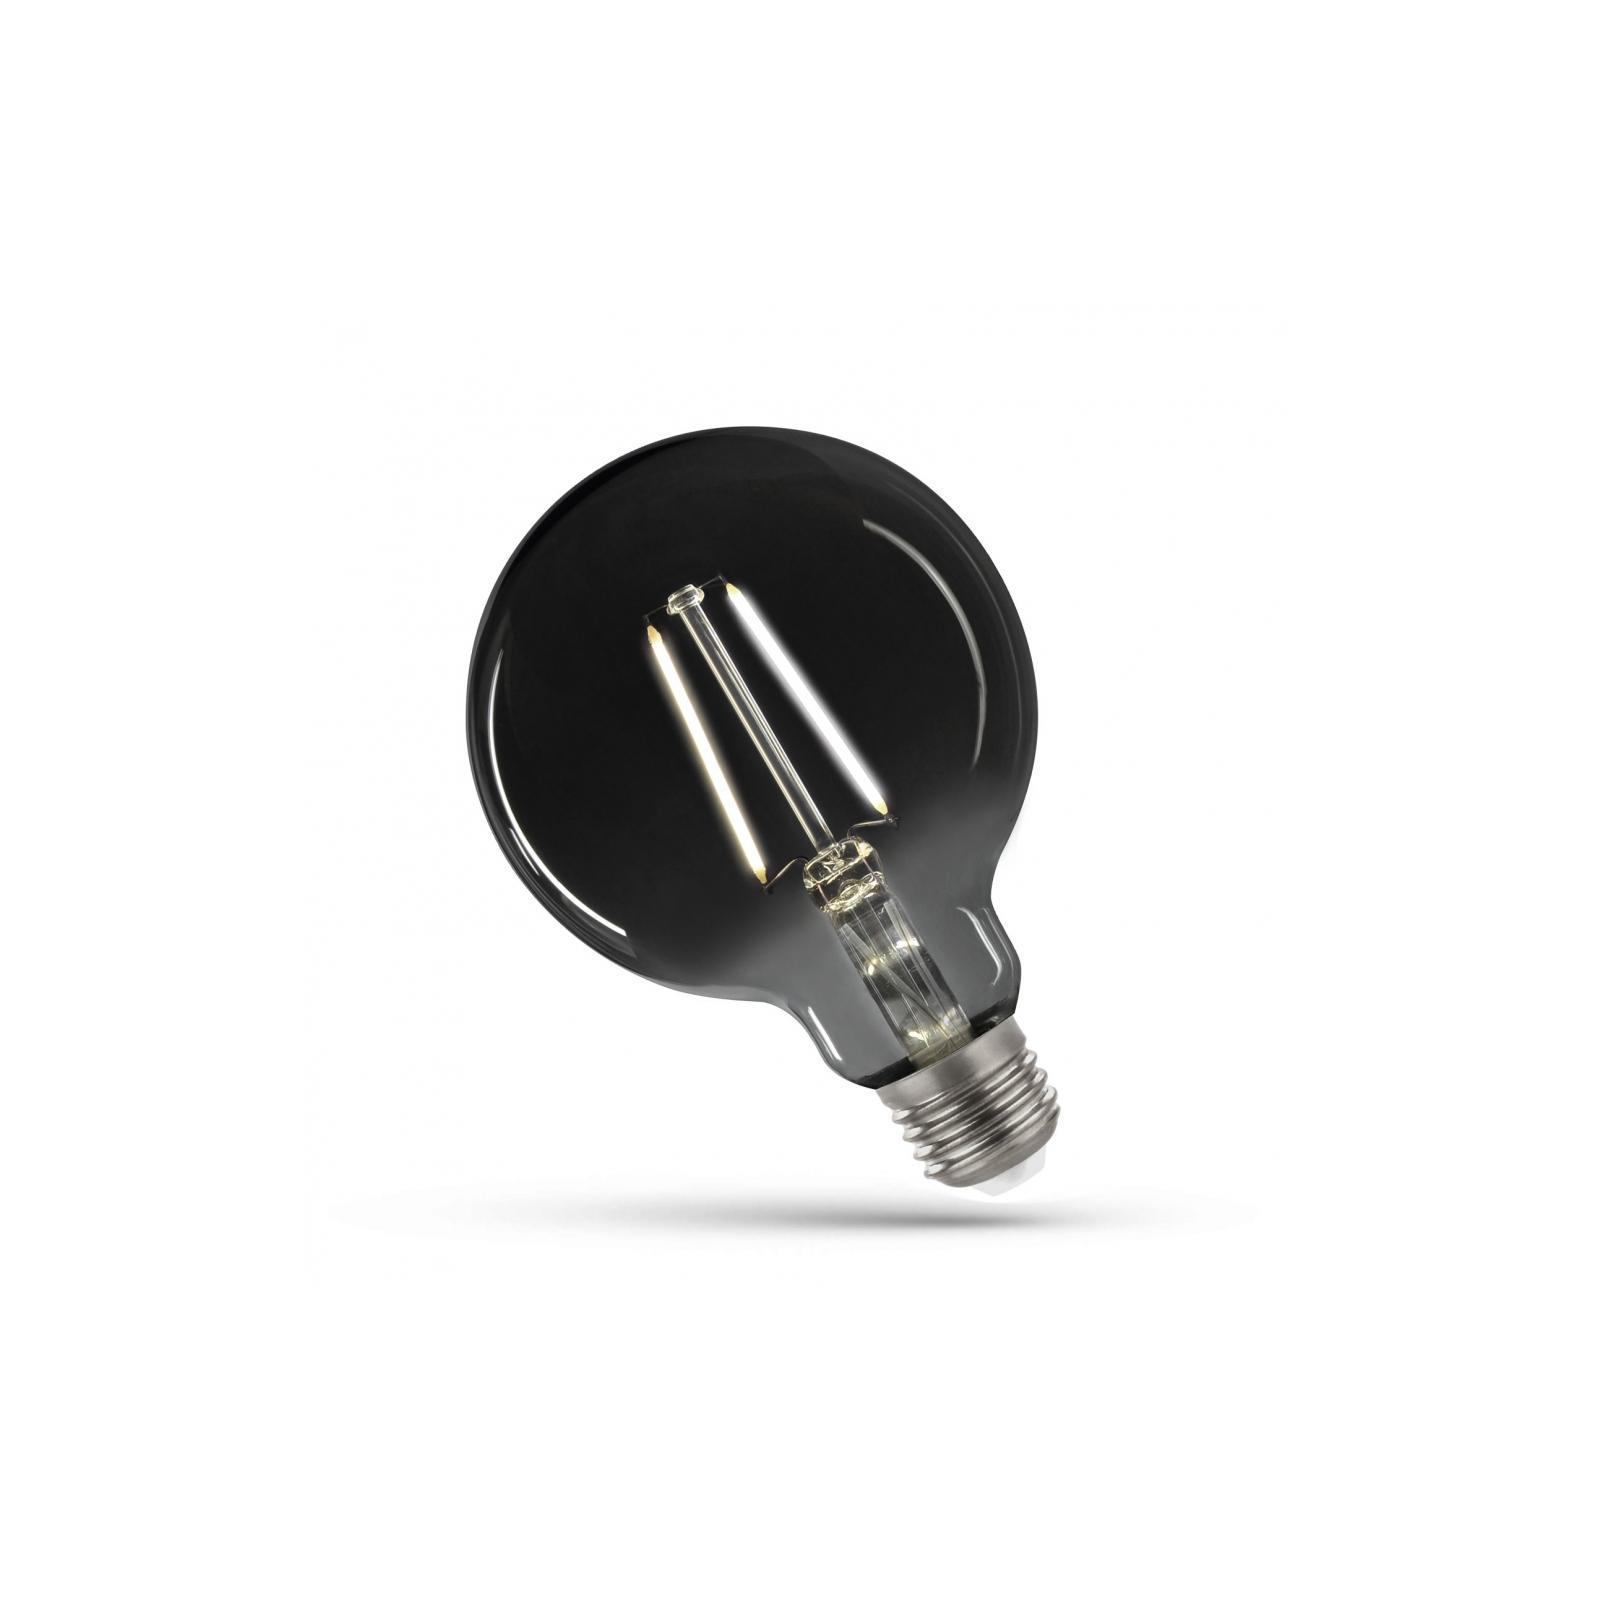 LED GLOB G125 E-27 230V 4.5W COG Neutrální bílá MODERNSHINE SPECTRUM